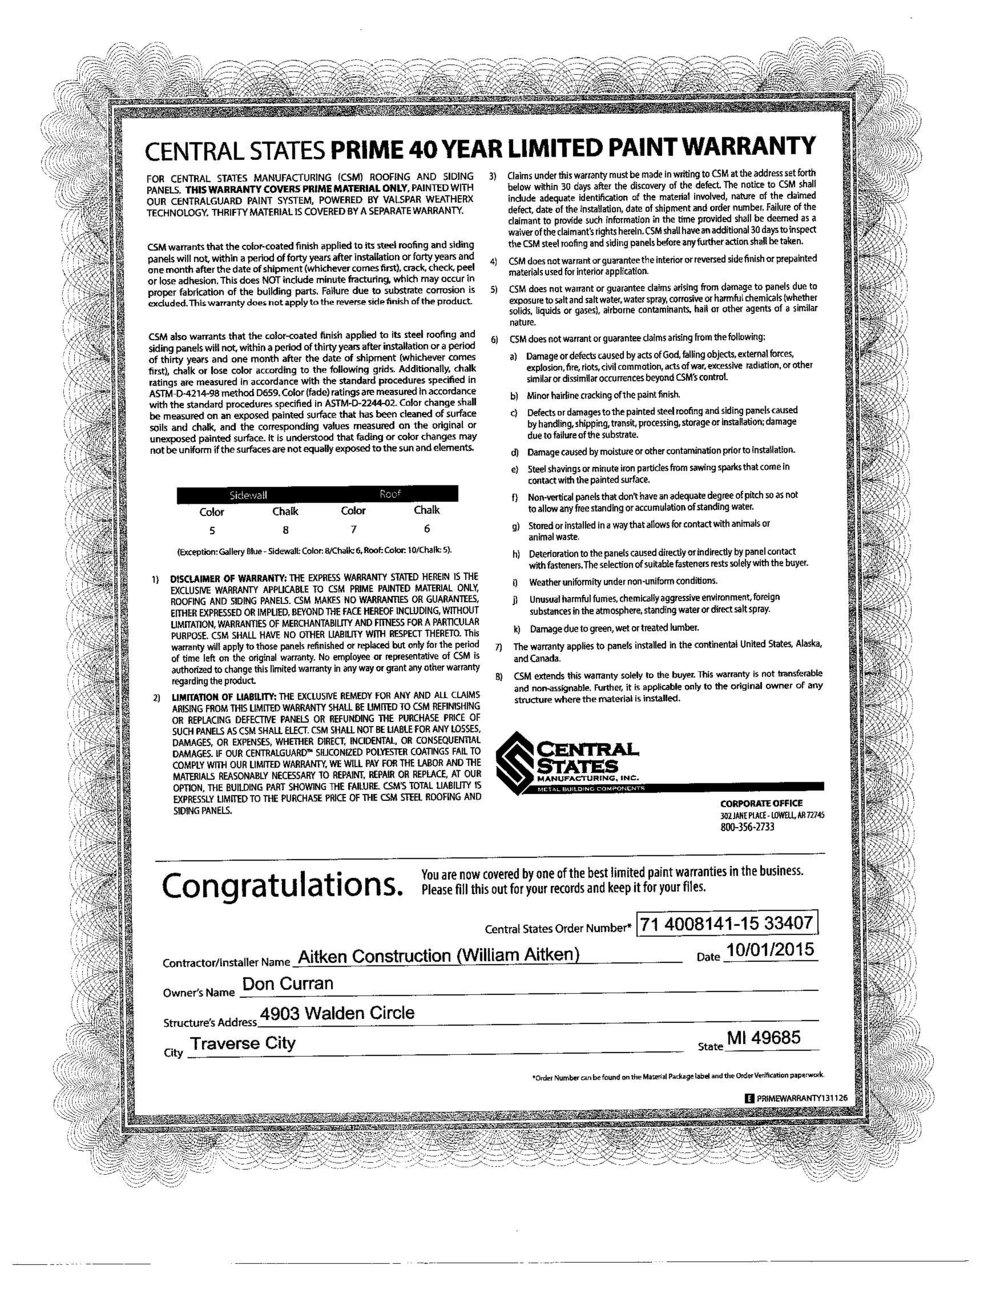 4903 Waldon Circle, Traverse City, MI – 3 Bedroom & 2 Bath Ranch Home for sale by Oltersdorf Realty LLC marketing packet (17).jpg